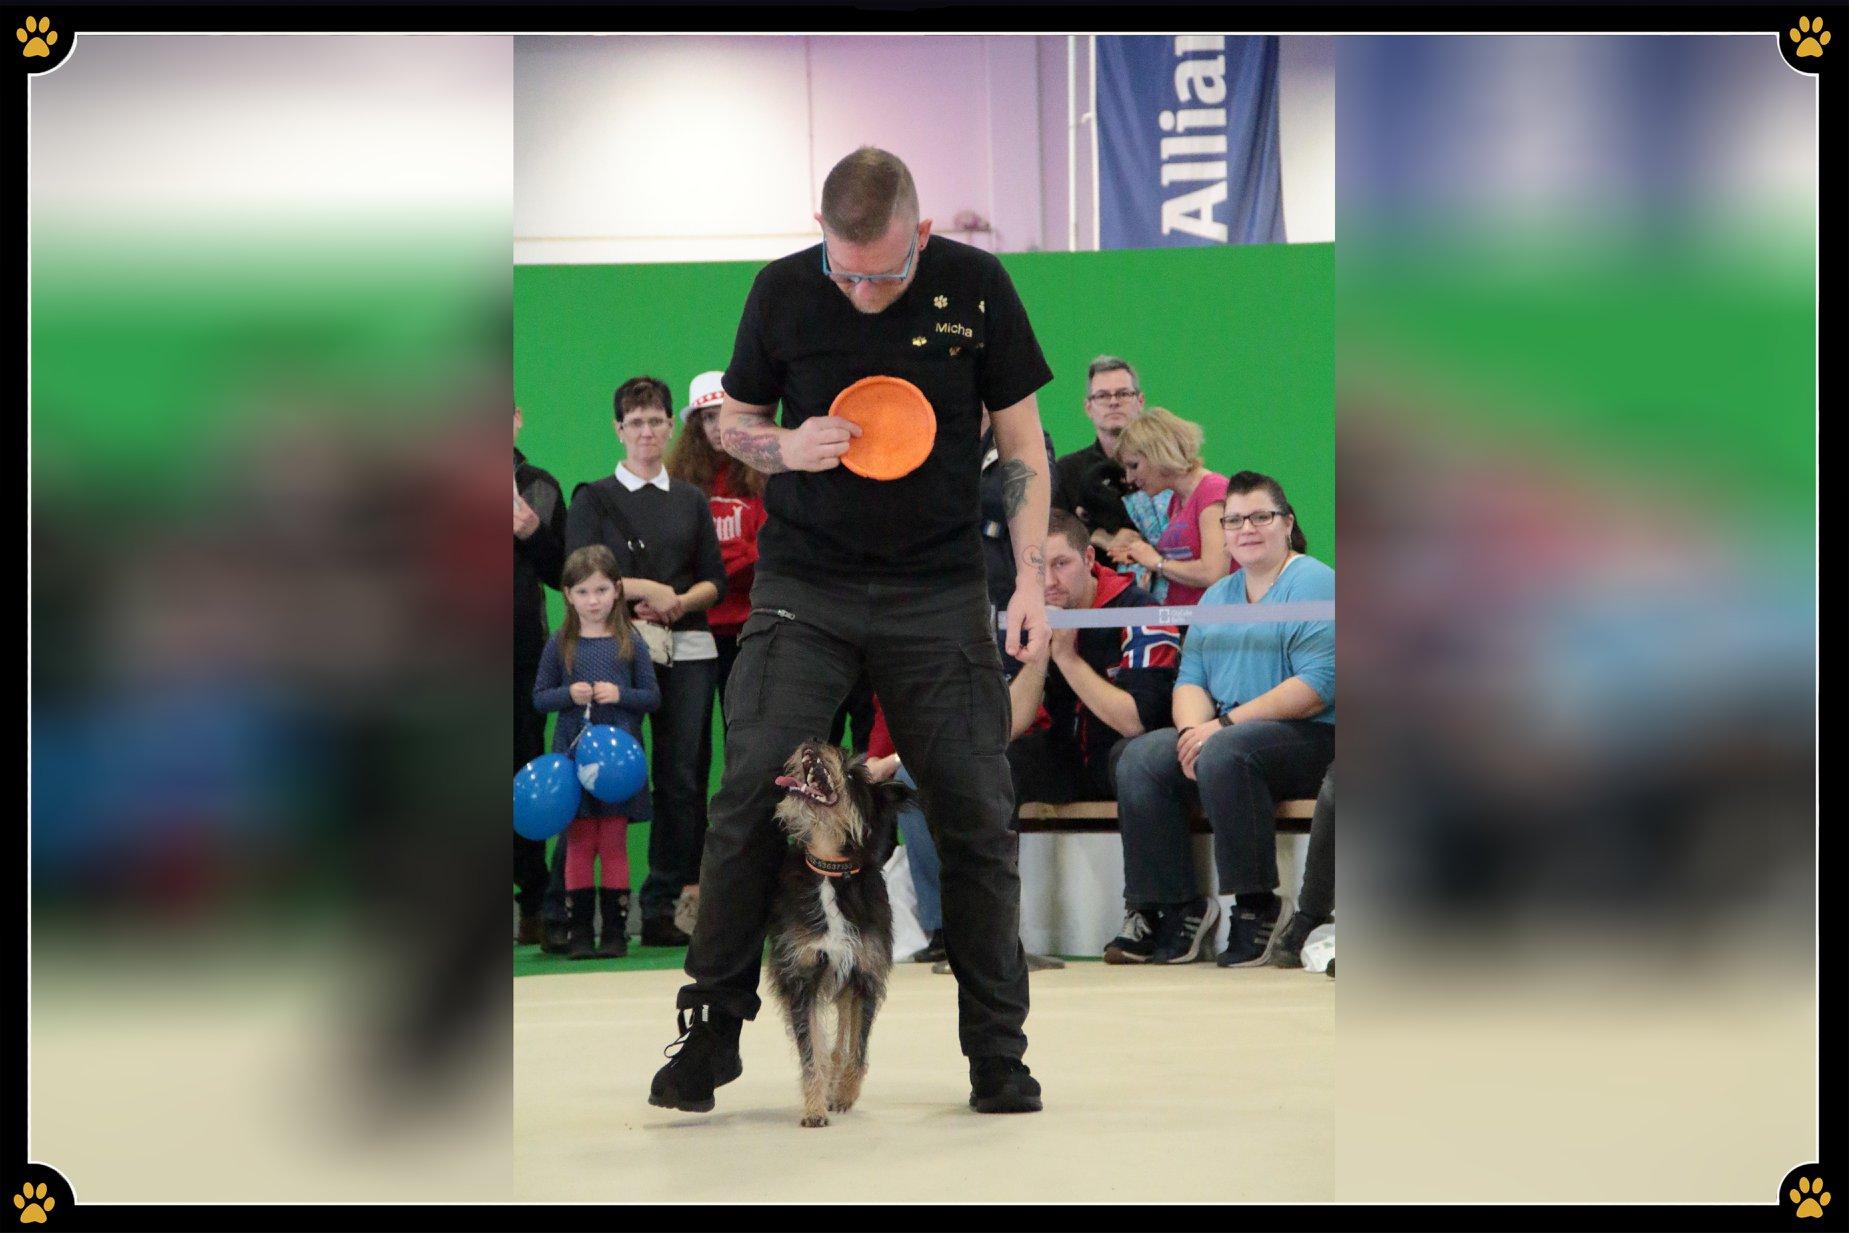 JoBaDog_Gruene_Woche_2019_Frisbee_1.jpg